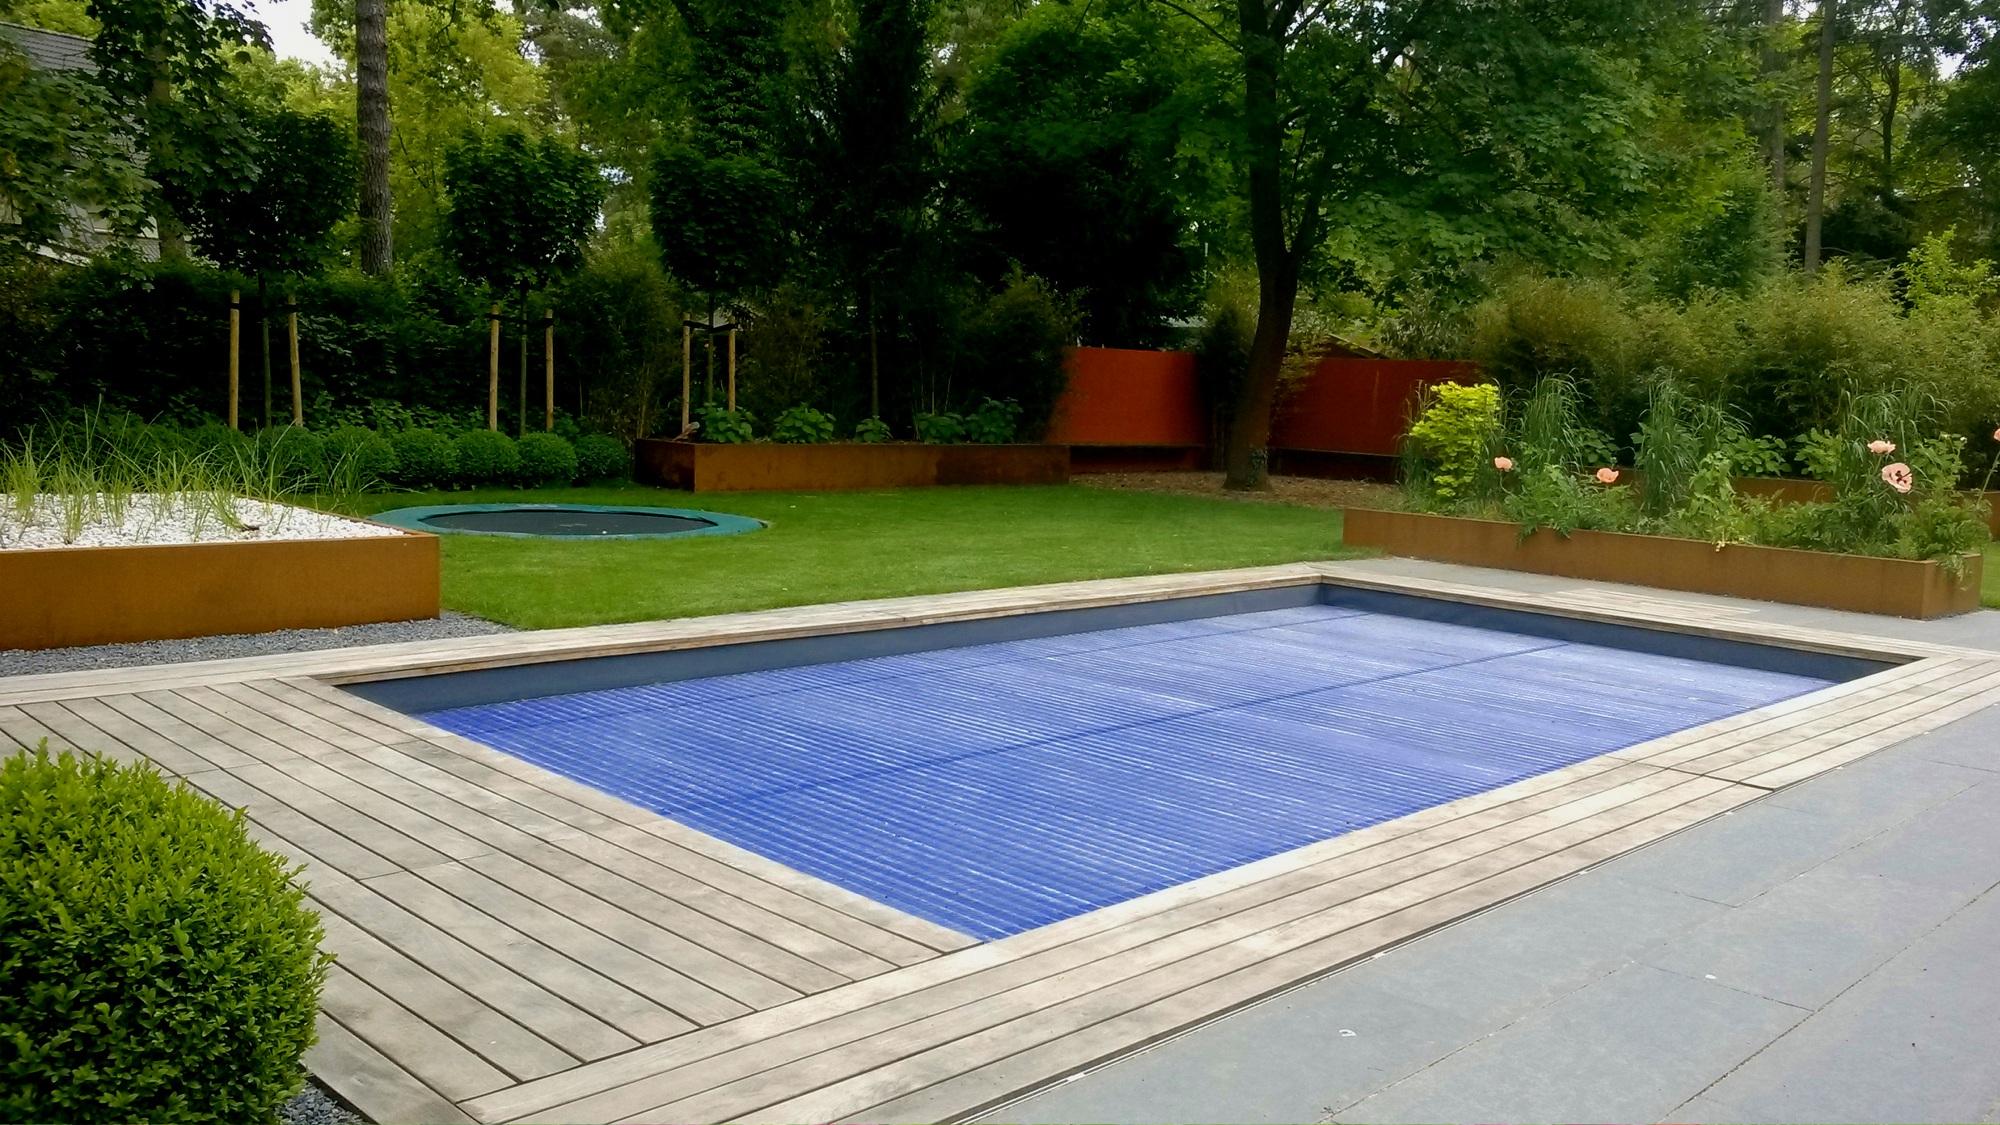 Heike_Bogatzki_Swimmingpool.jpg